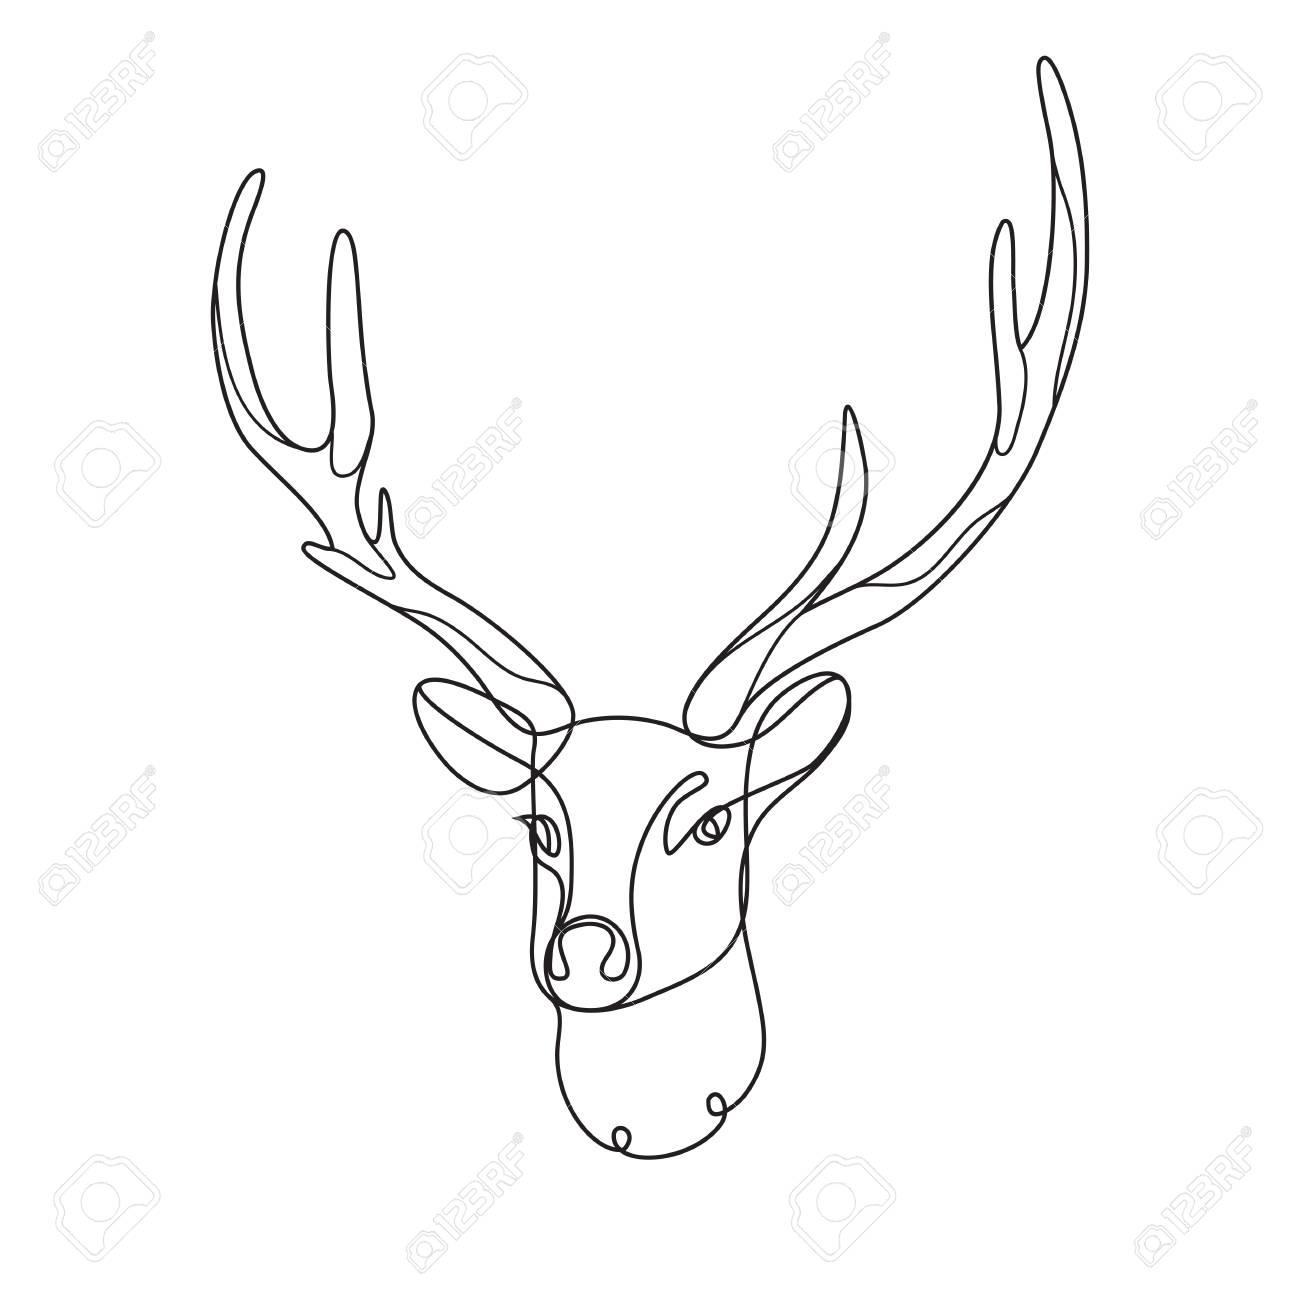 Line Art Deer Abstract Modern Decoration Vector Illustration